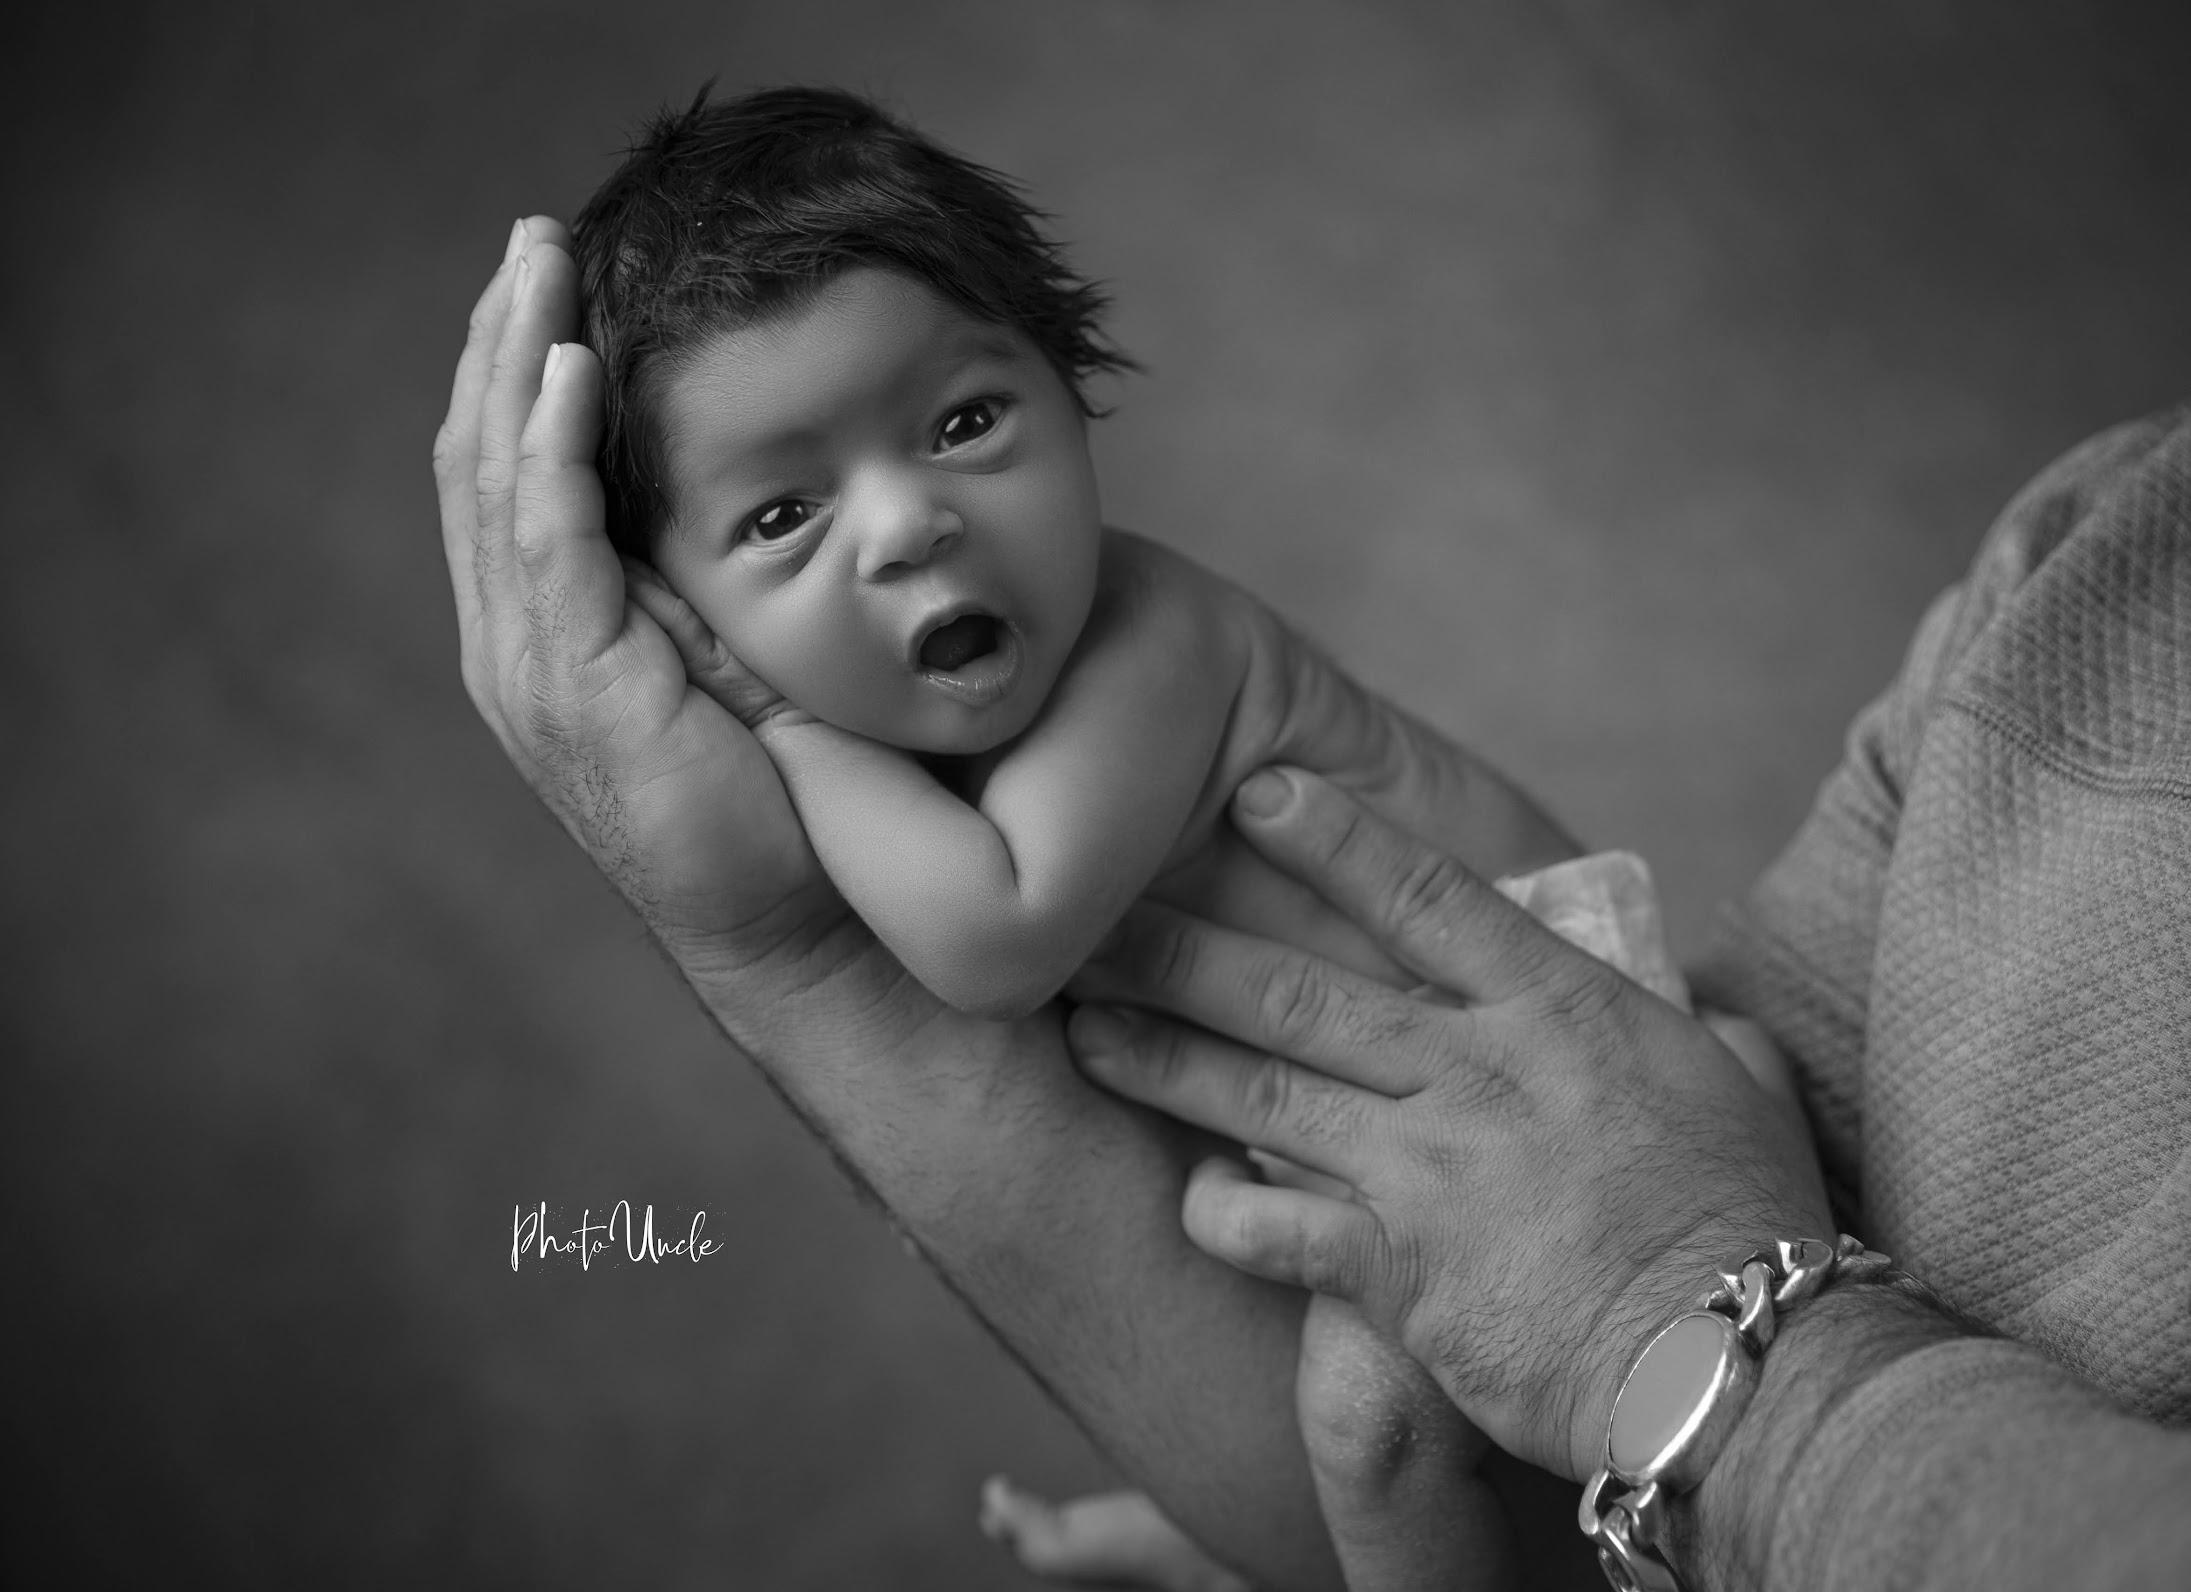 newbornbooking - image on https://photouncle.com